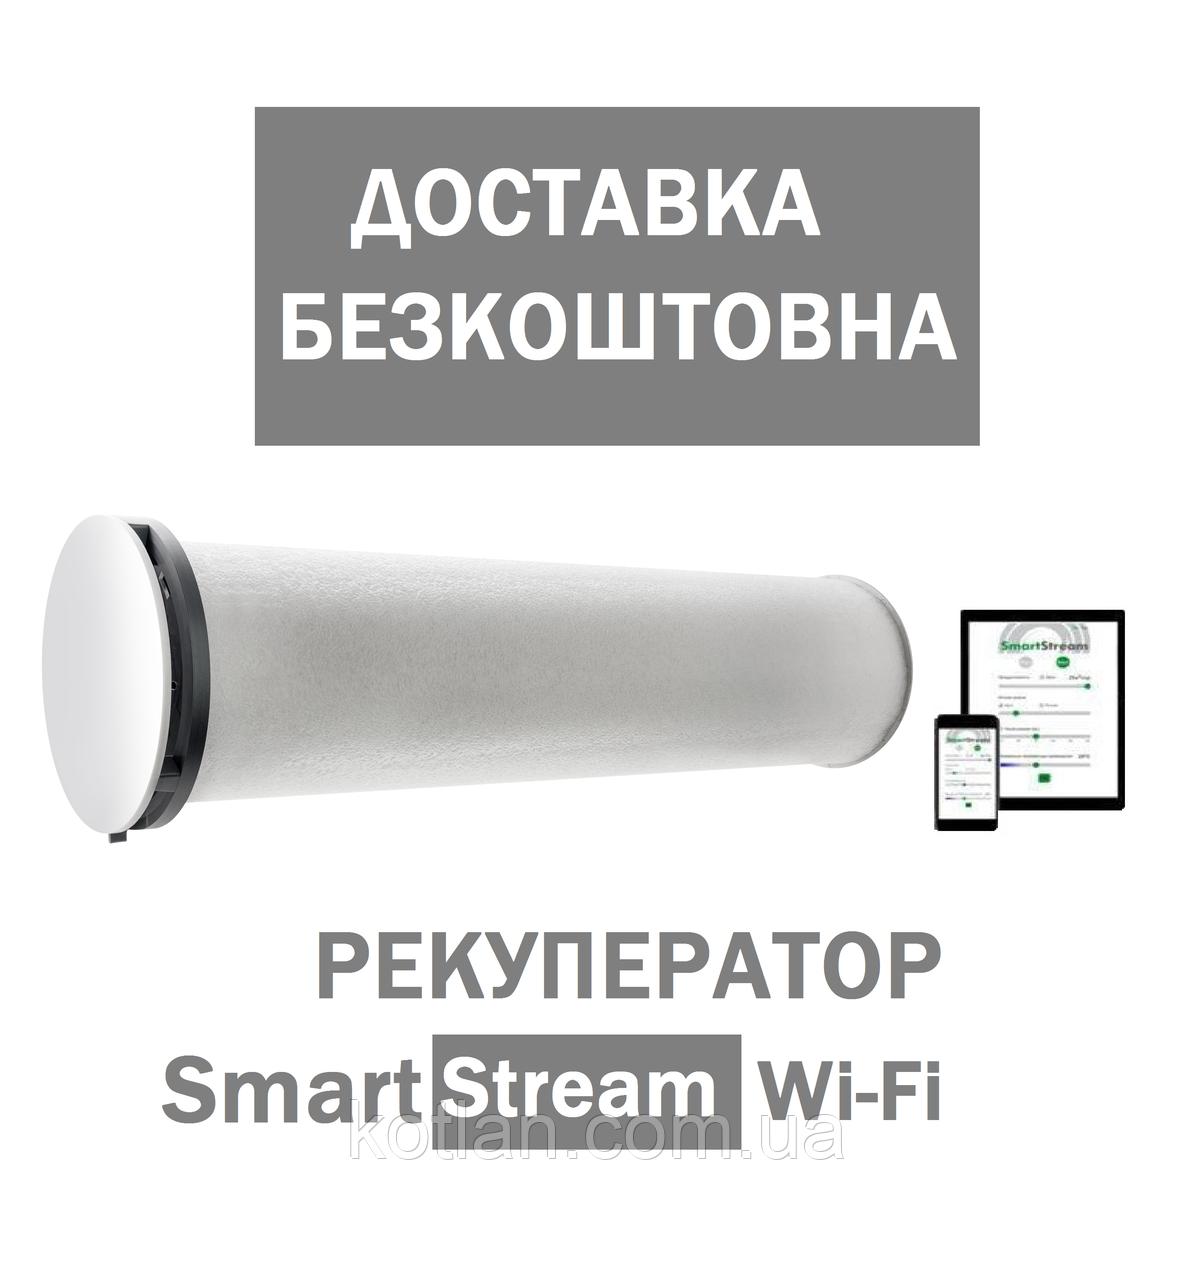 Рекуператор Smart Stream M150 Wi-Fi